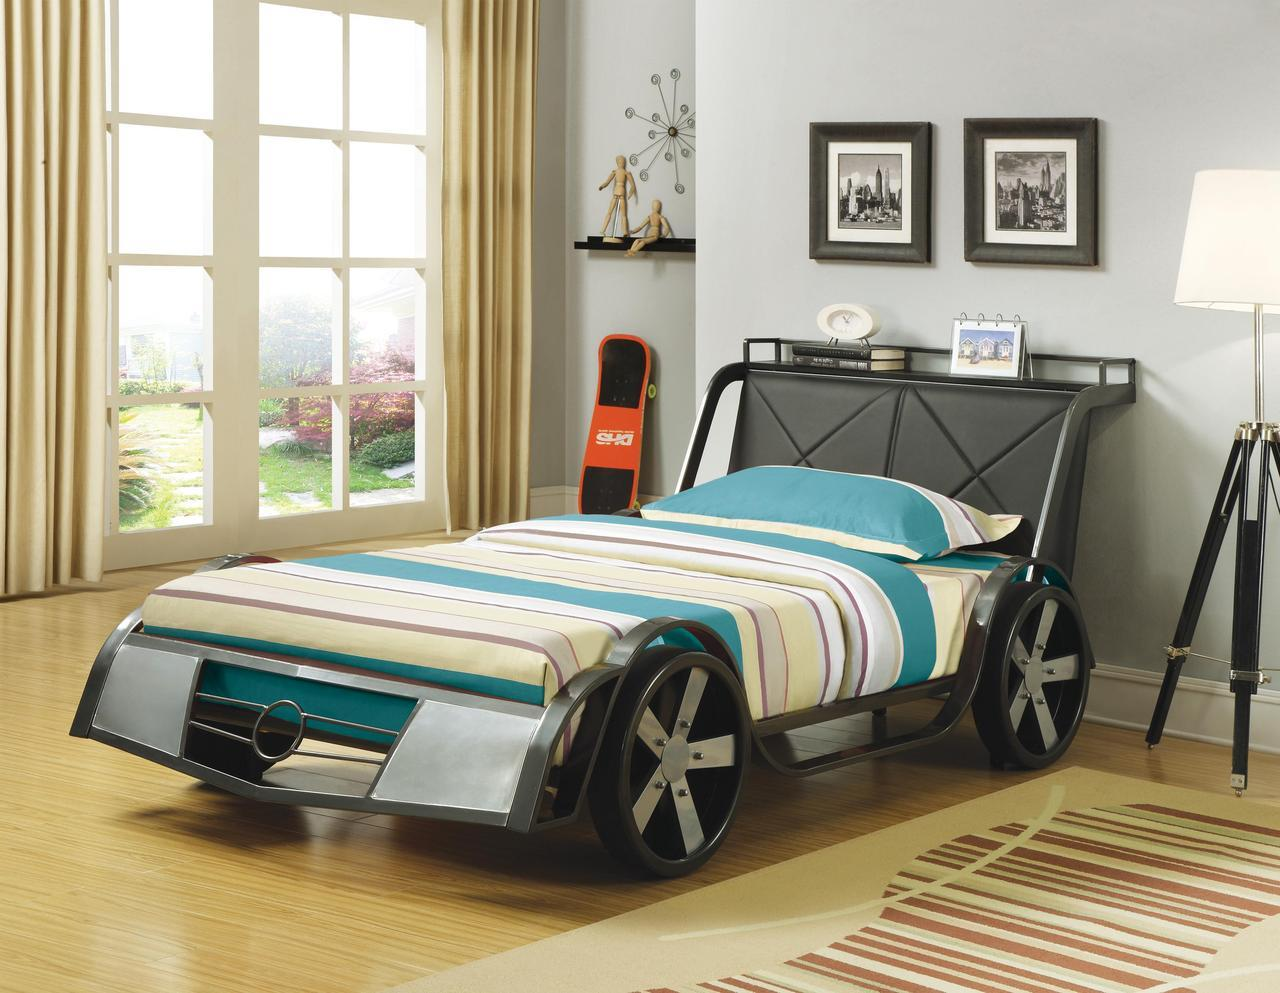 Metal Car Beds for Kids